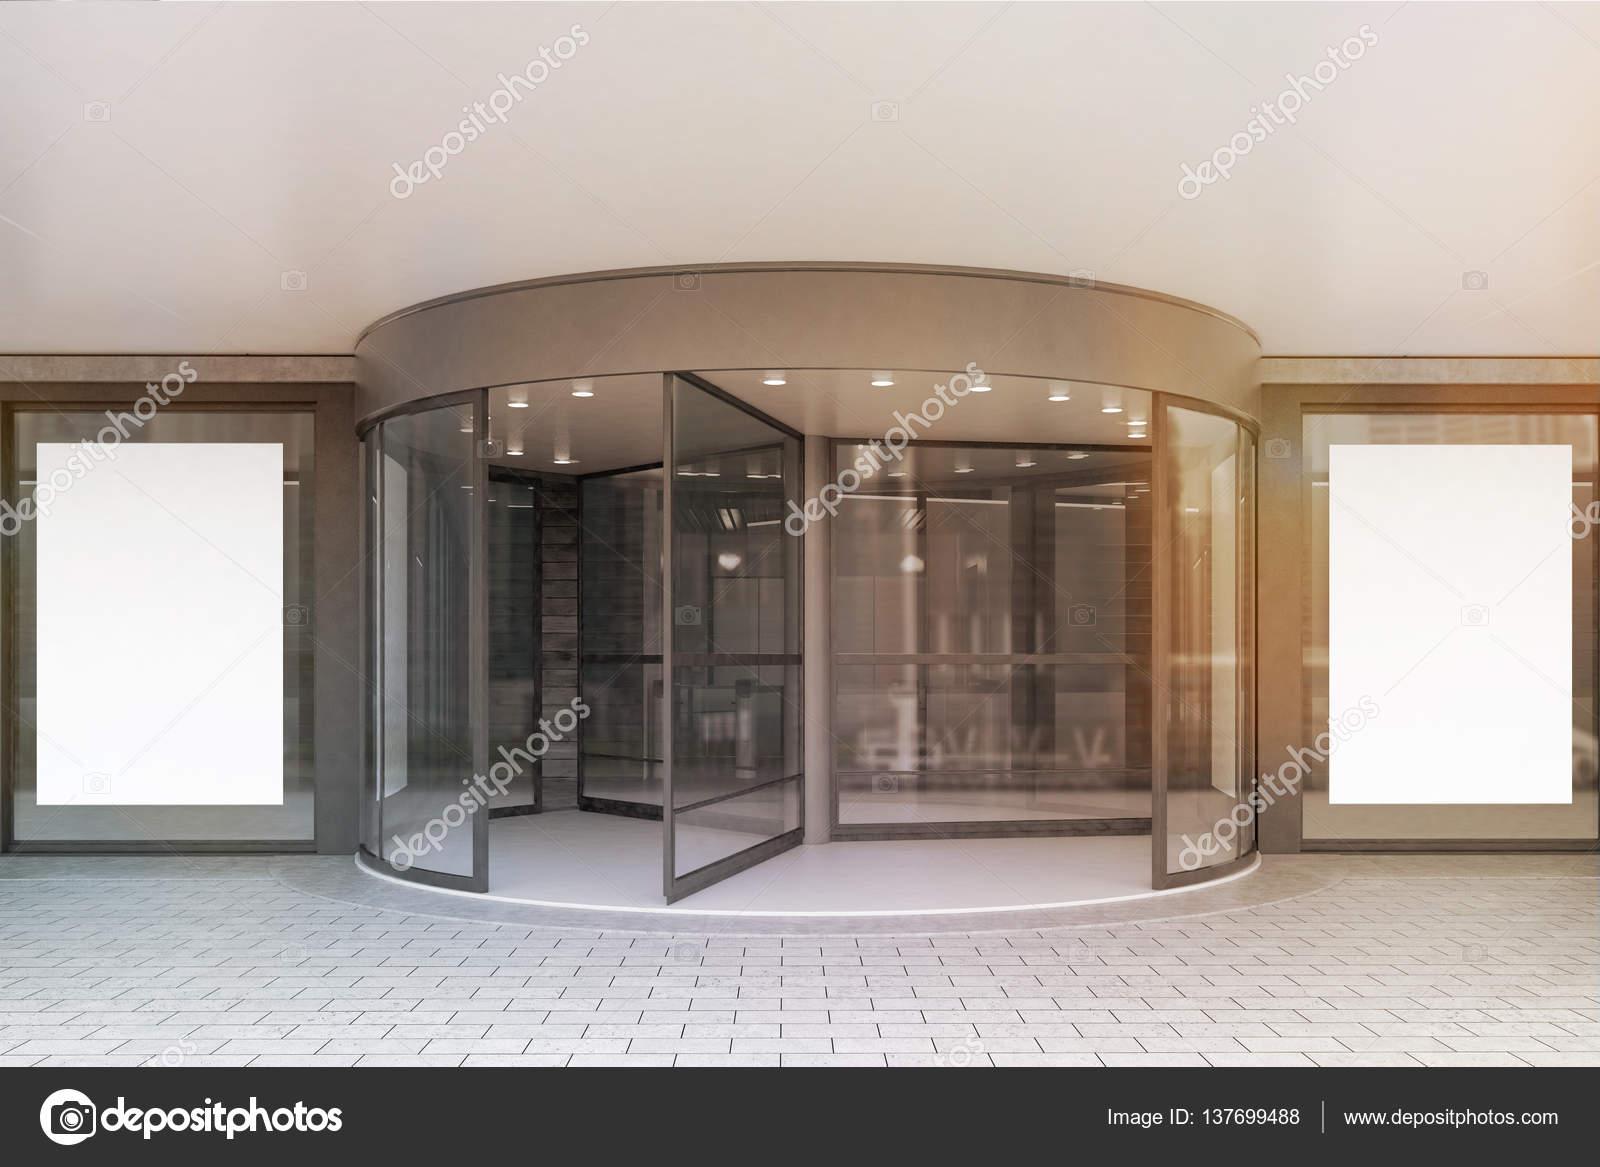 Glazen deuren van corporate gebouw affiches afgezwakt stockfoto 137699488 - Glazen ingang ...